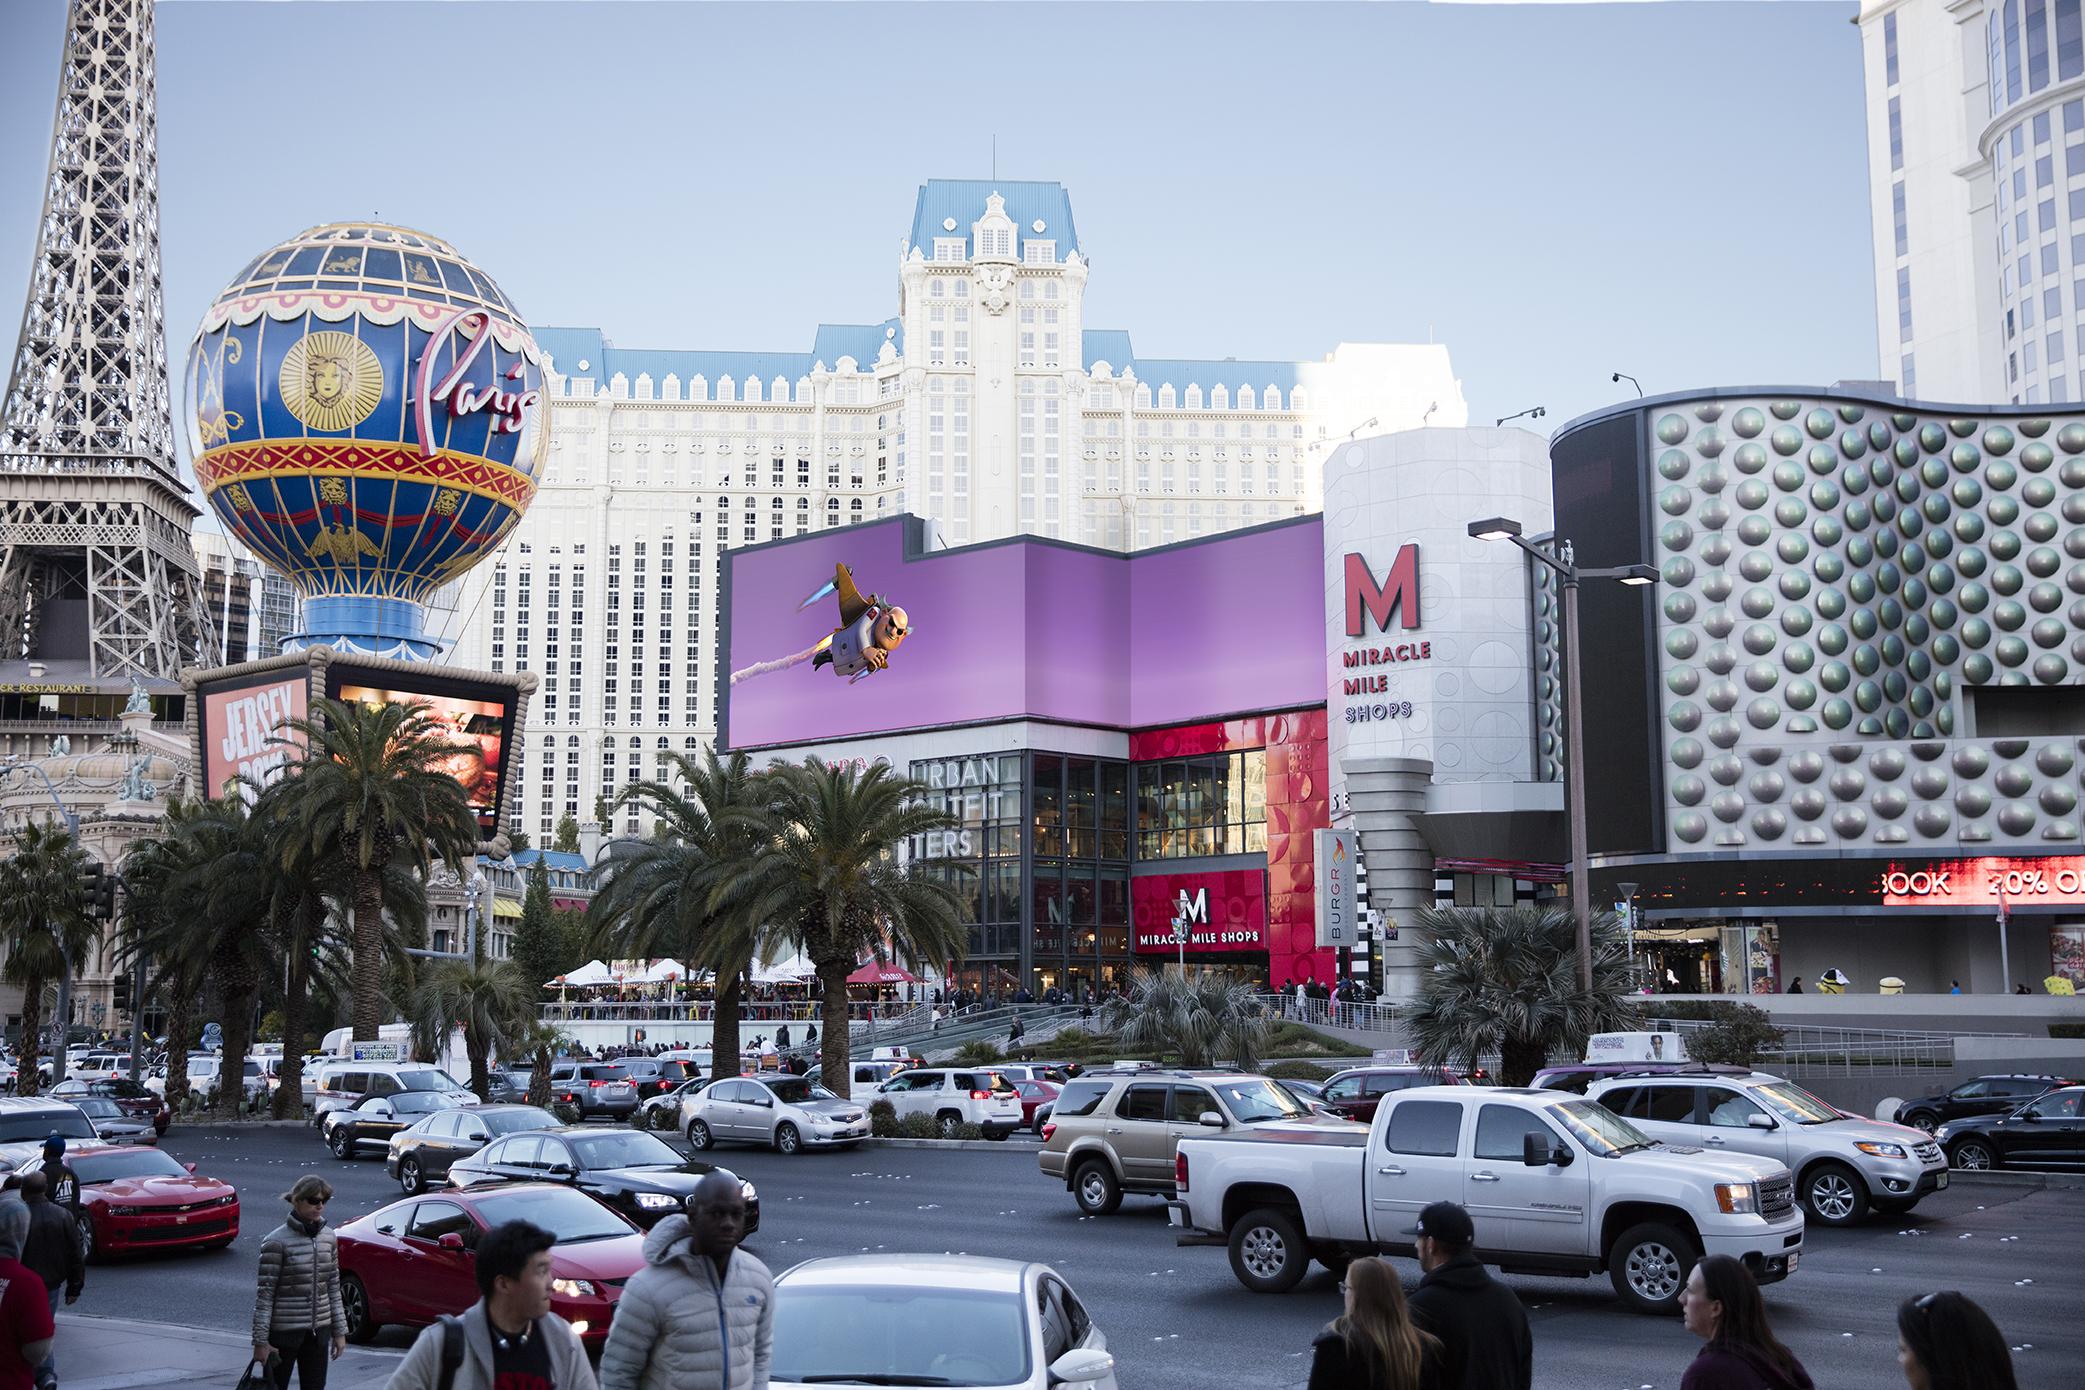 BoomBeach_OOH_Vegas_0V5A0919_LowRes.jpg